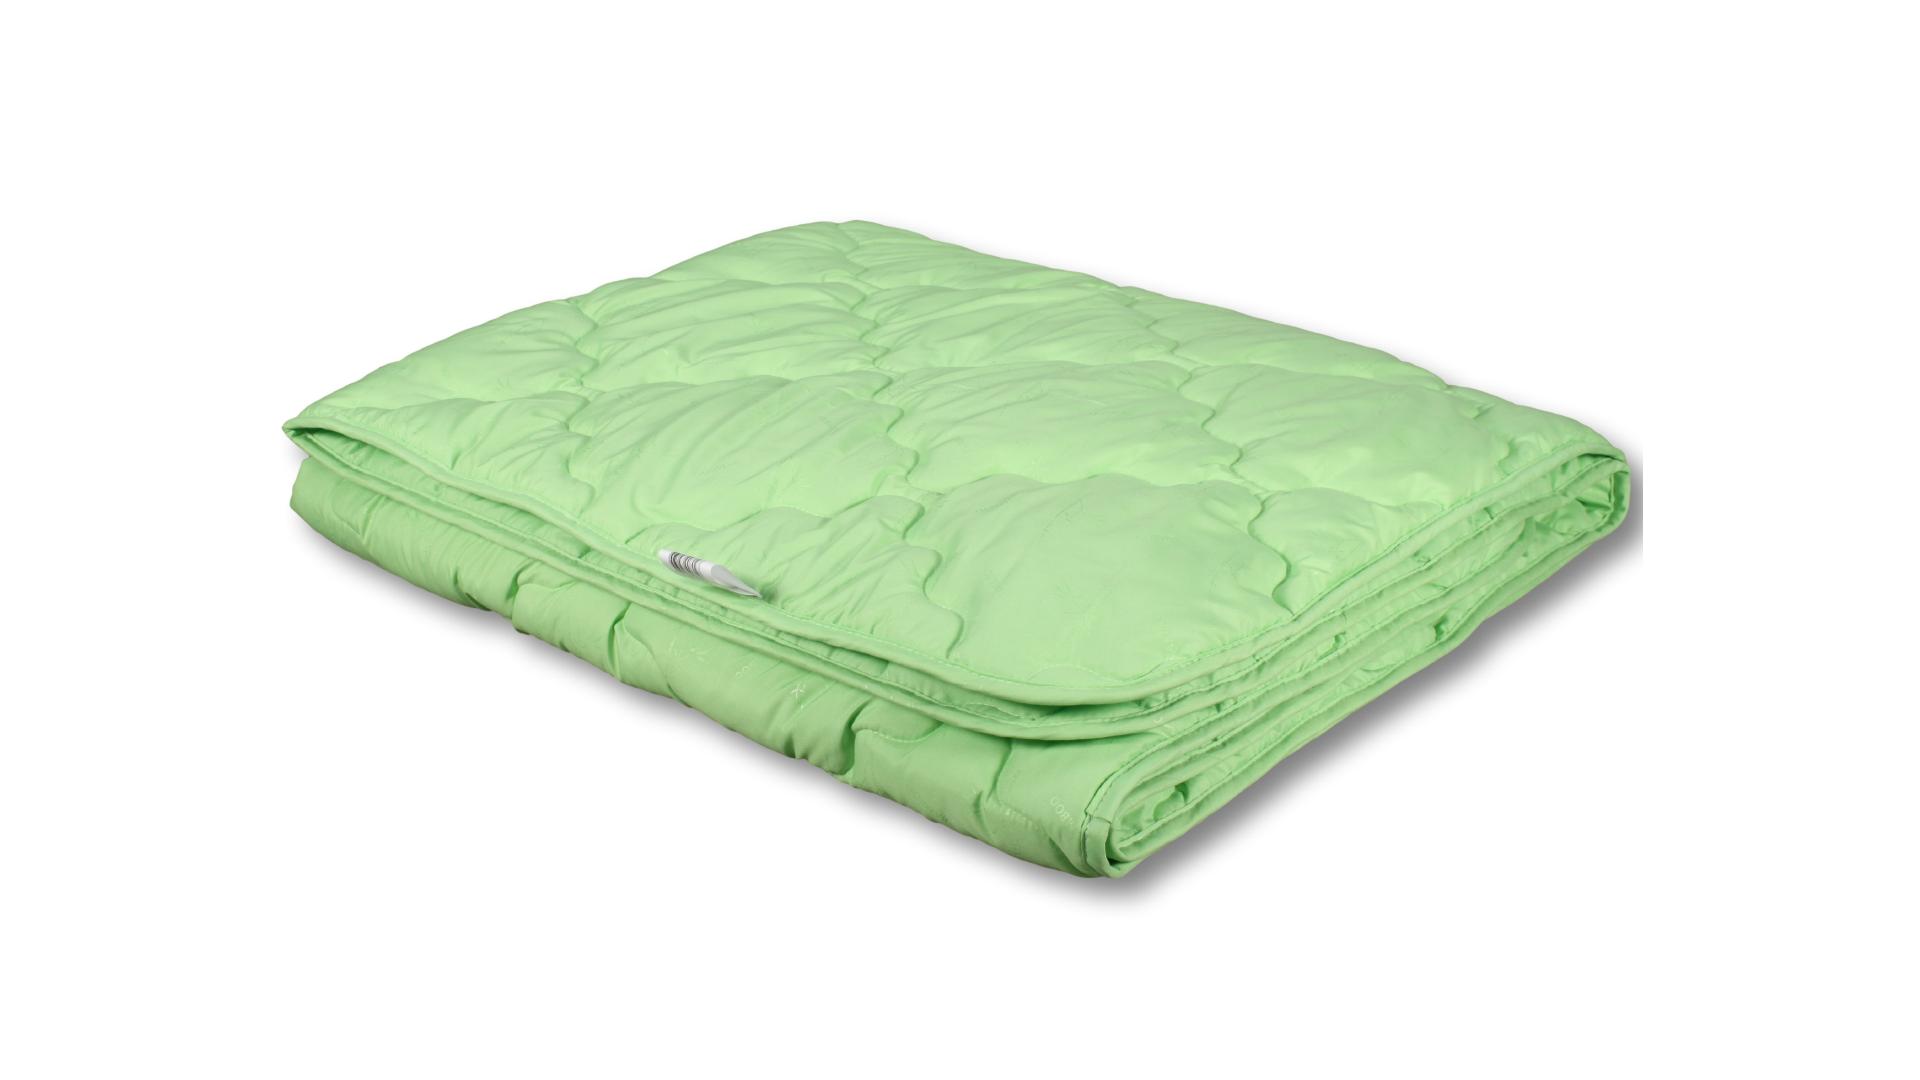 Одеяло Микрофибра-Бамбук Лёгкое фото FullHD (0)